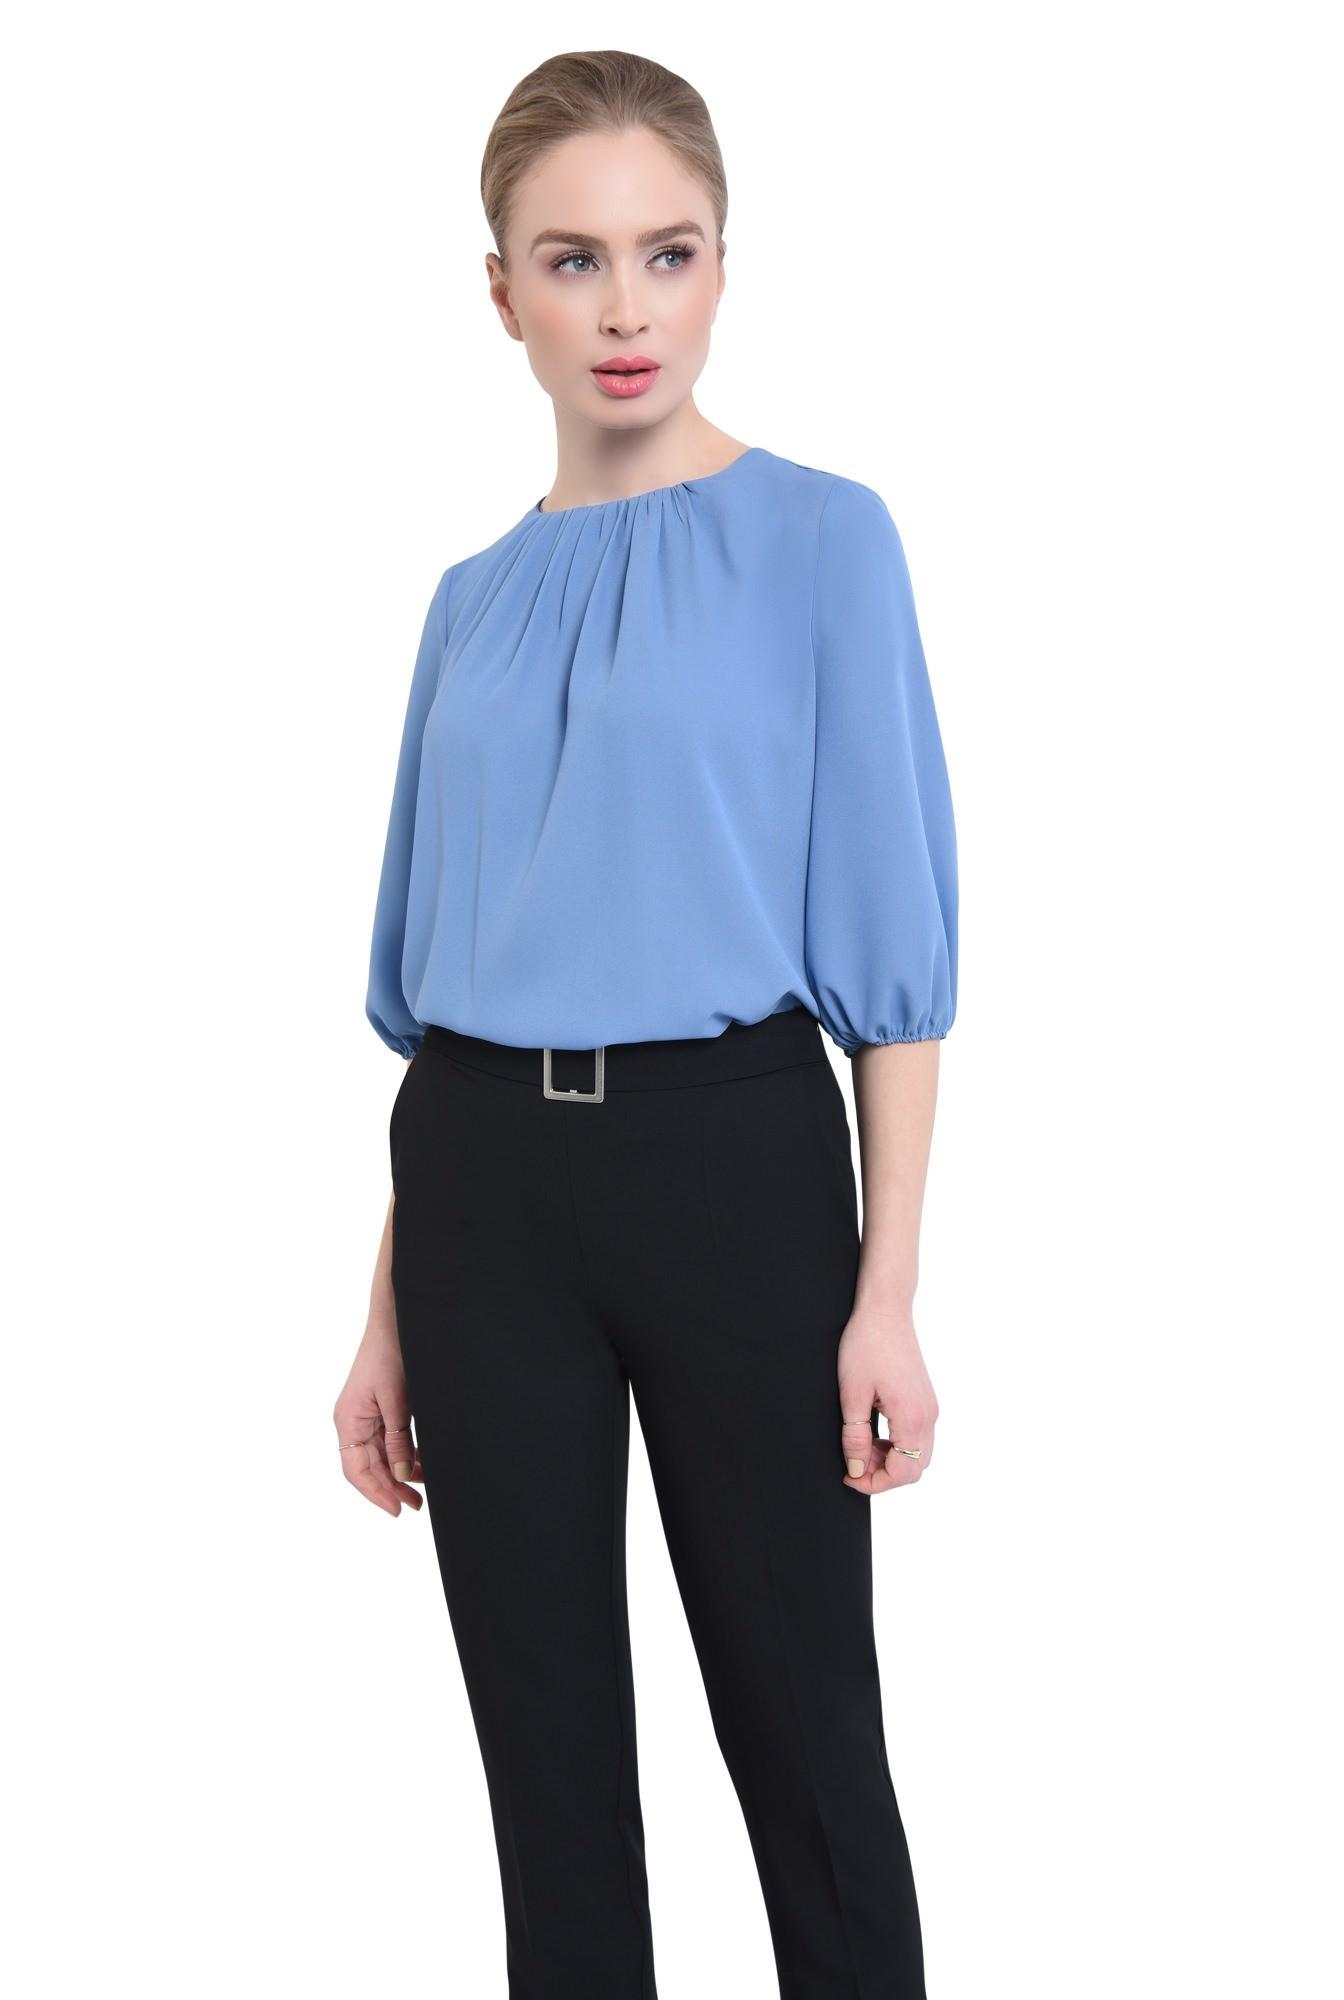 0 - Bluza casual, bleu, decolteu rotund